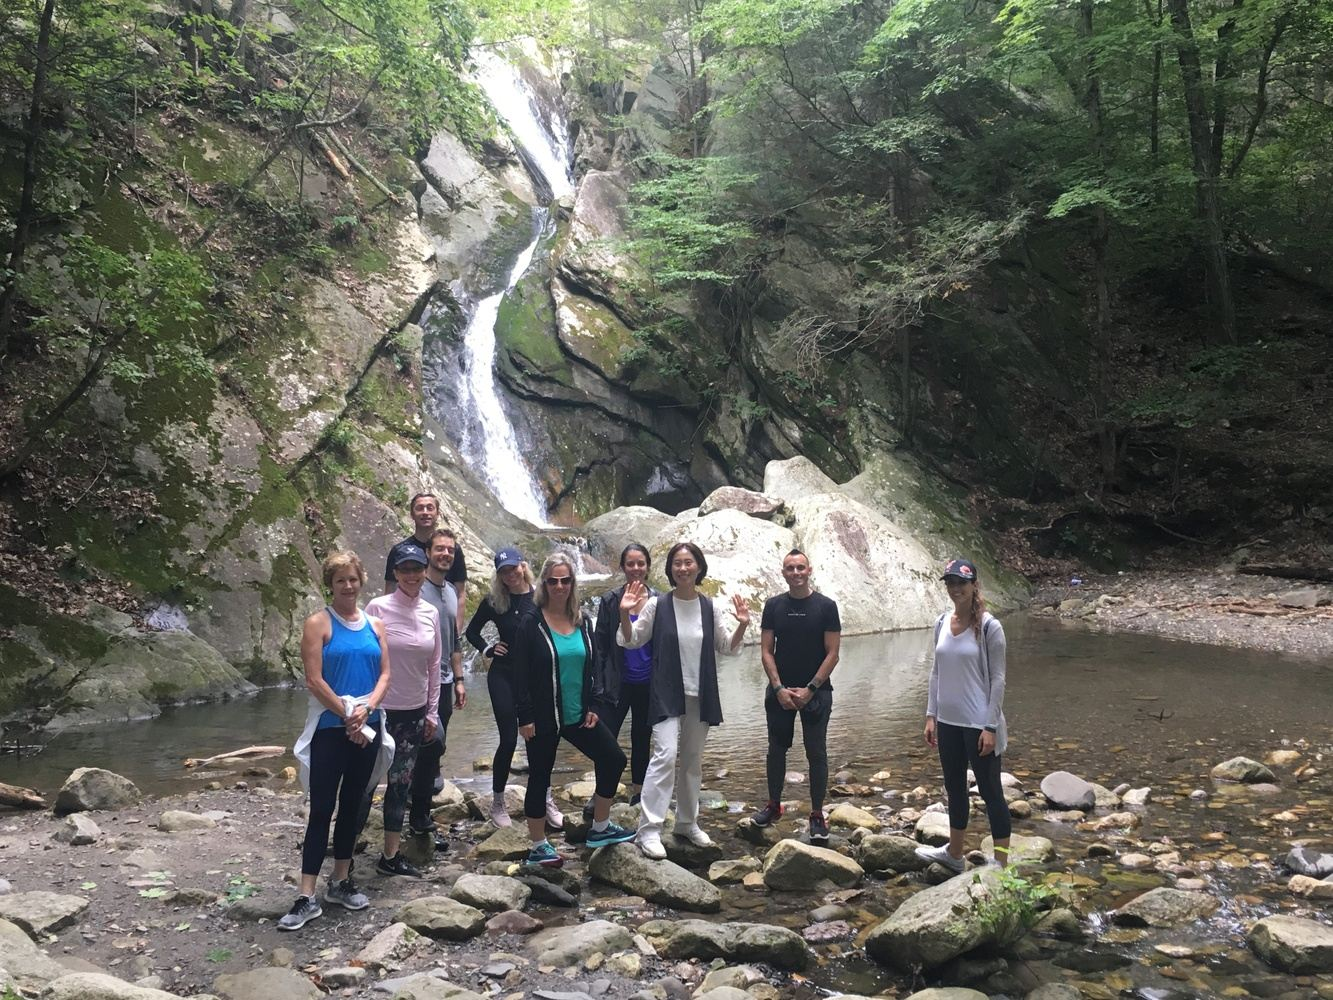 Catskill's R&R Retreat : Secret to a Long, Healthy & Happy Life